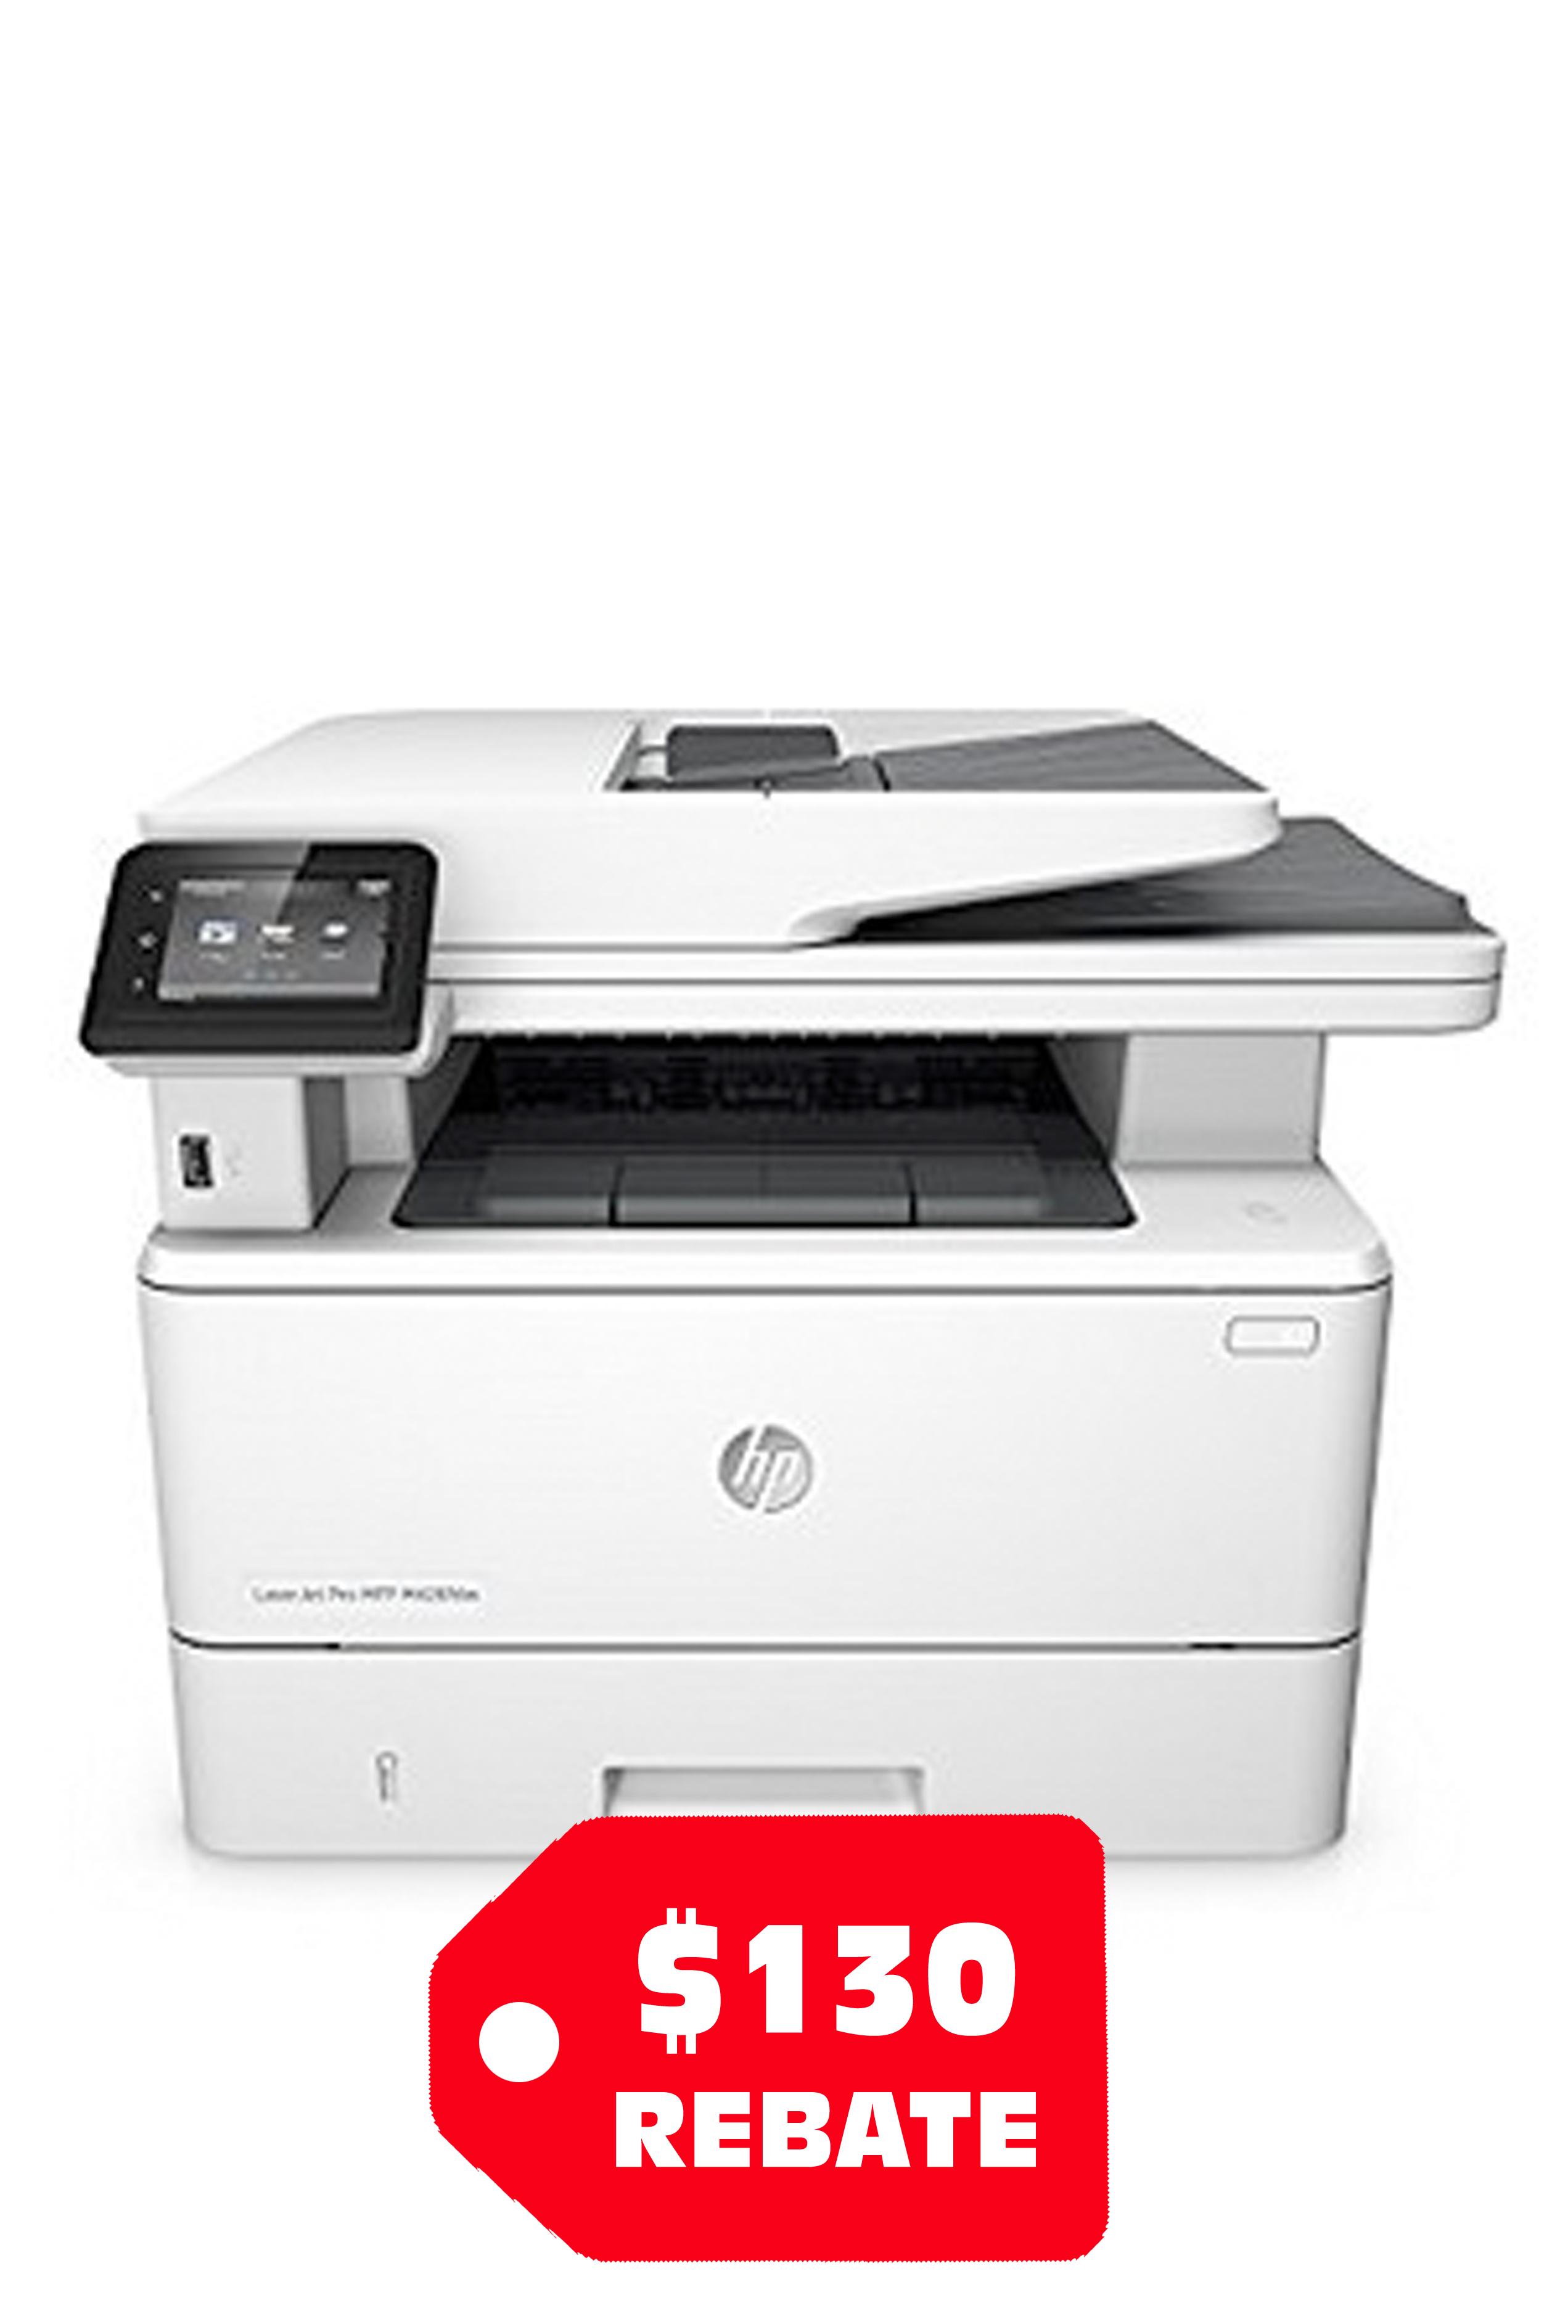 HP Black & White LaserJet Pro MFP M426FDW 40ppm Multifunction...